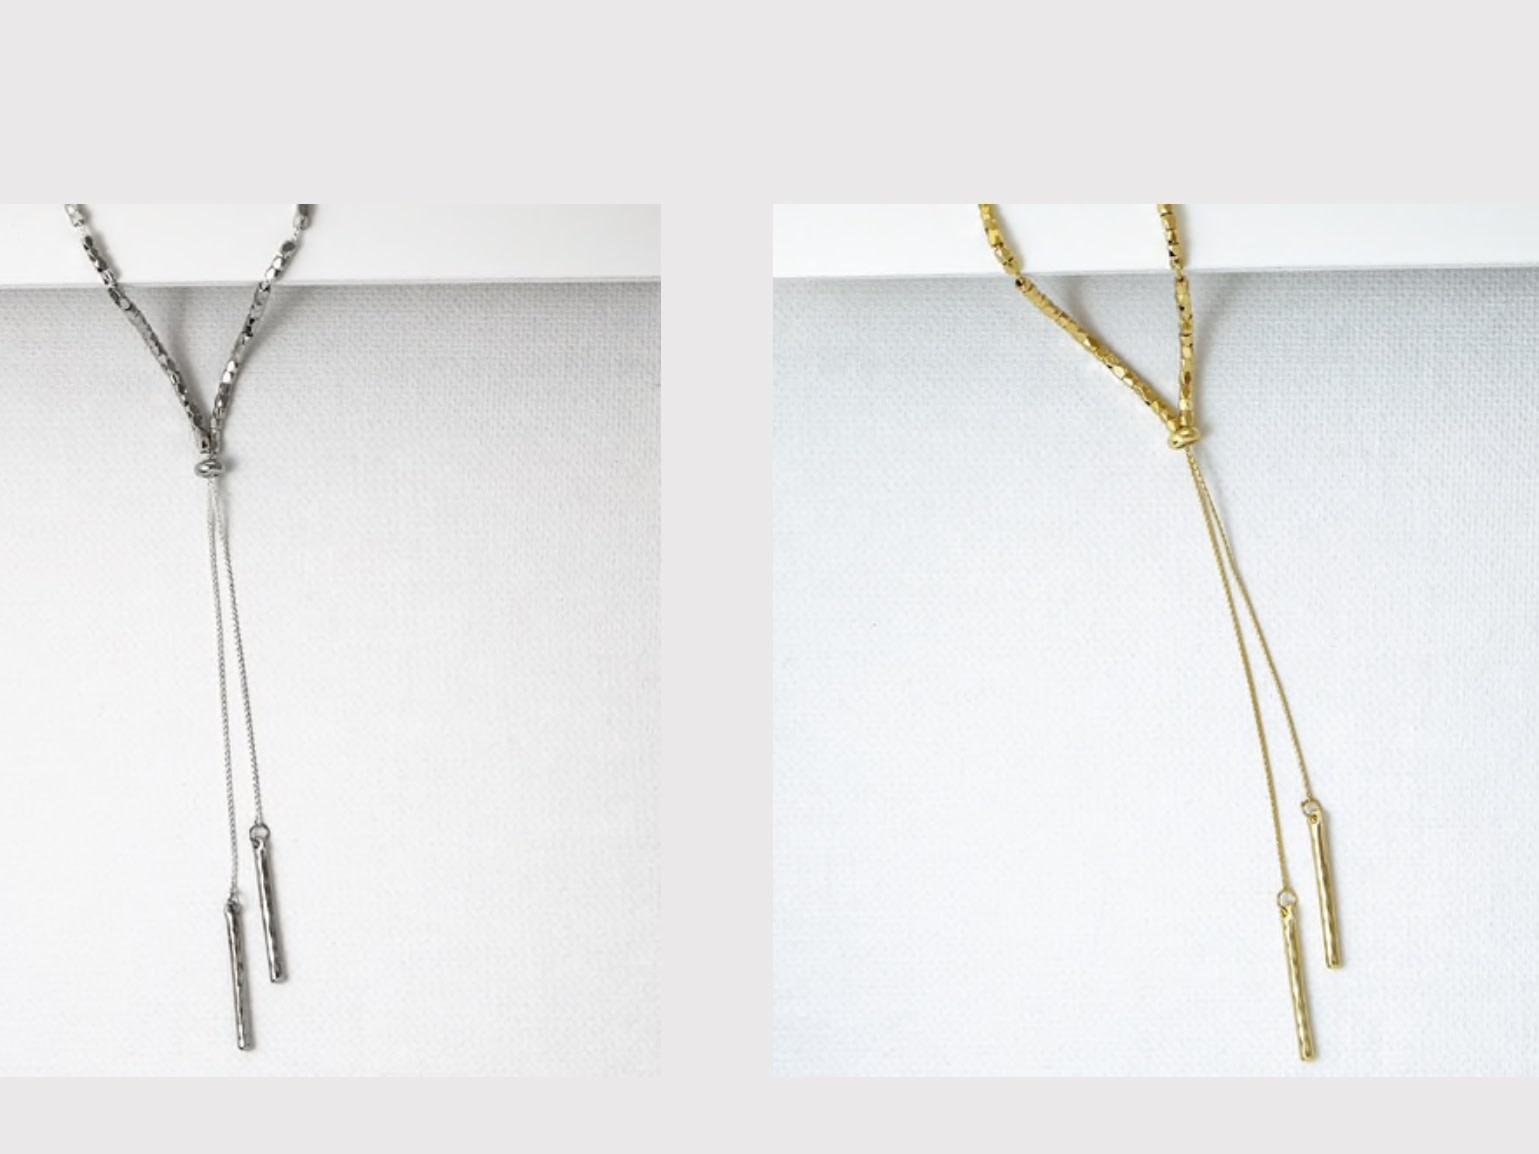 Accessorizit NK Metal Beads w/Slide Function